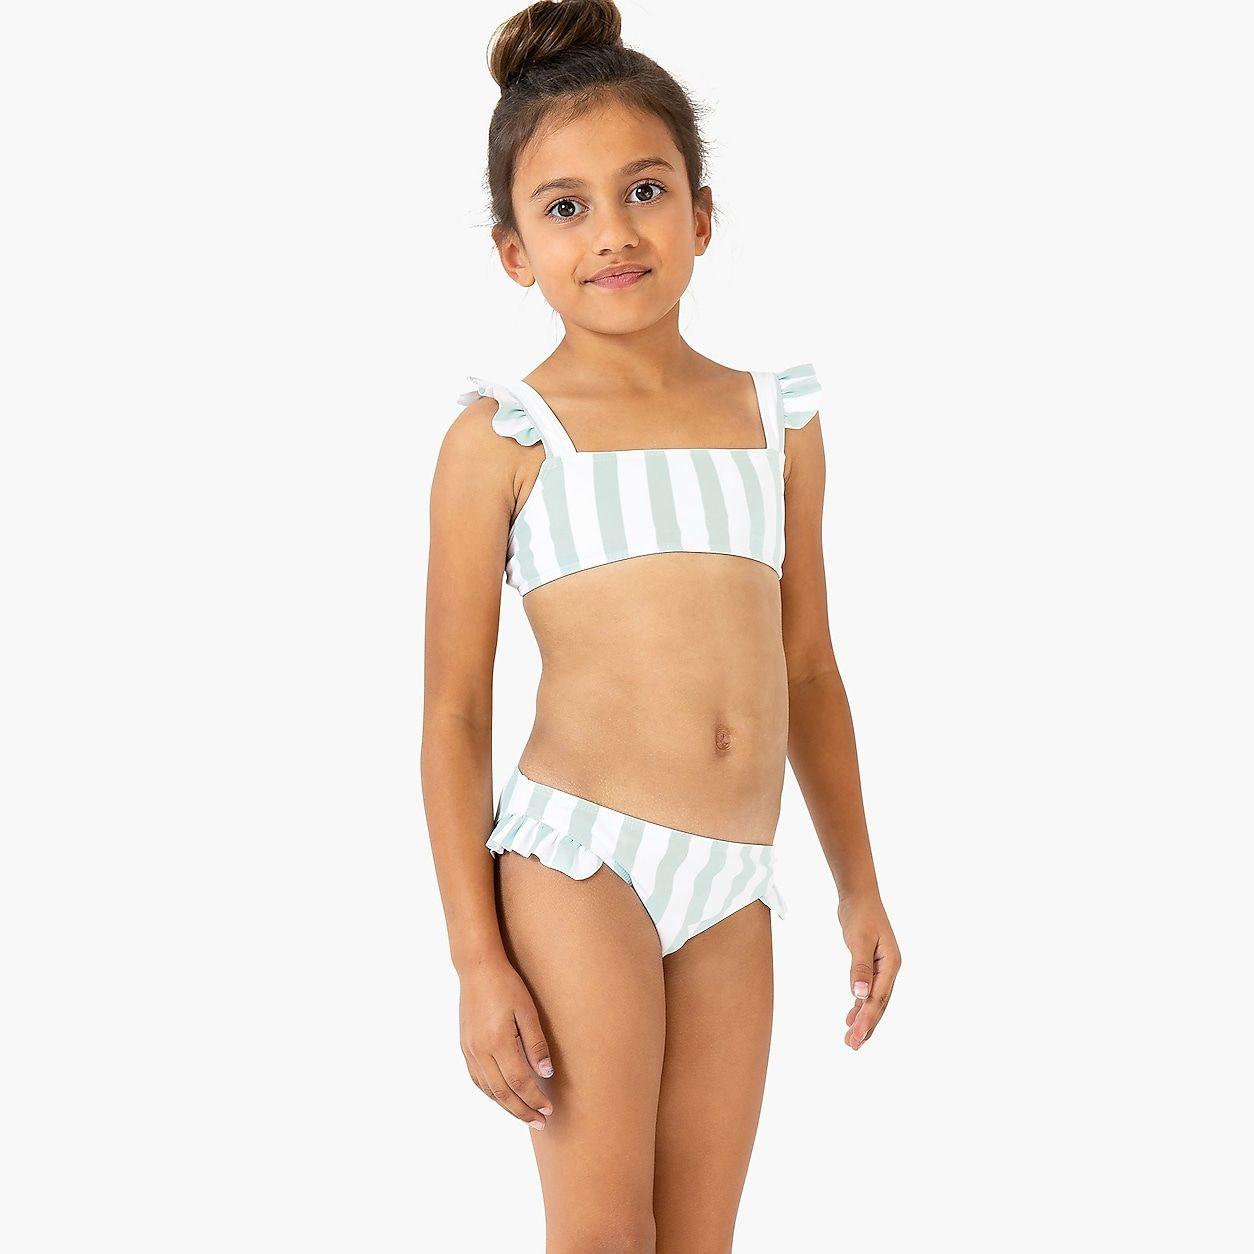 efbf8da13f crewcuts Minnow Tie Back Bikini | Products in 2019 | Bikinis, Kids ...